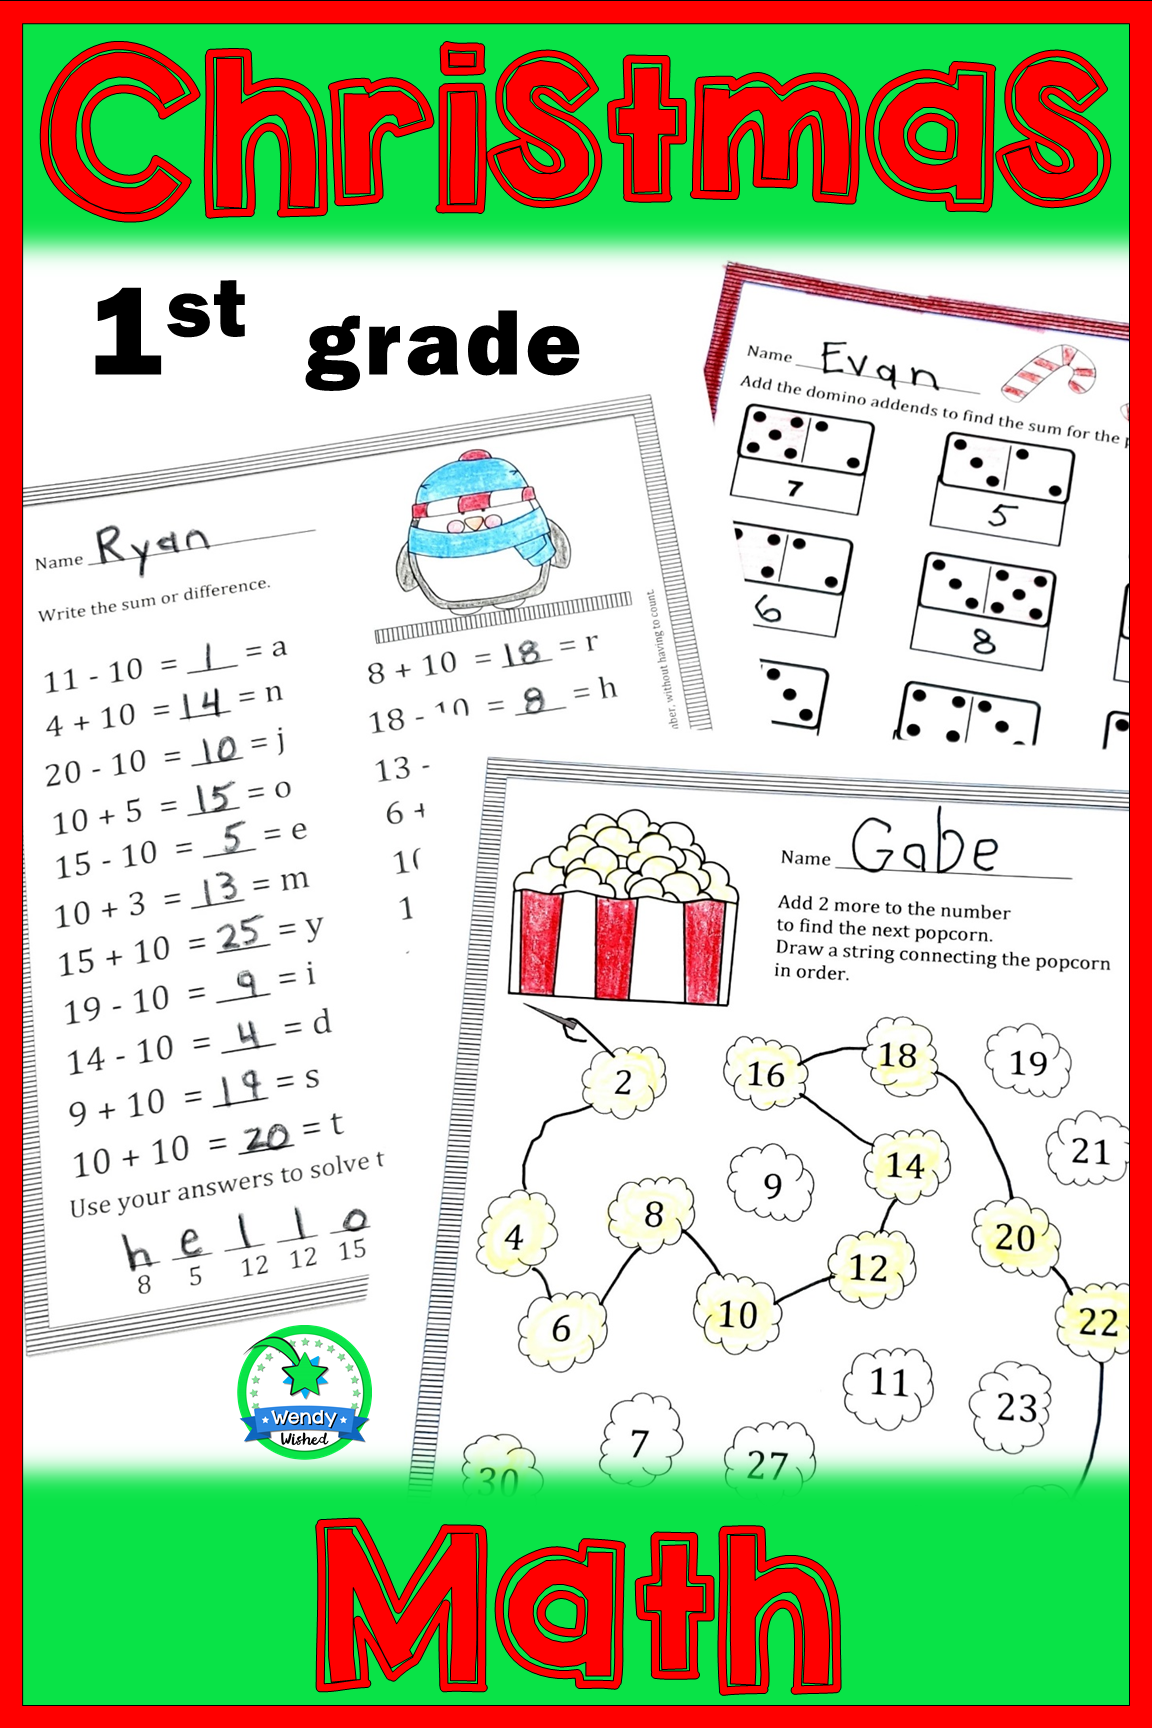 Christmas Math Worksheets for 1st grade   Christmas math worksheets [ 1728 x 1152 Pixel ]